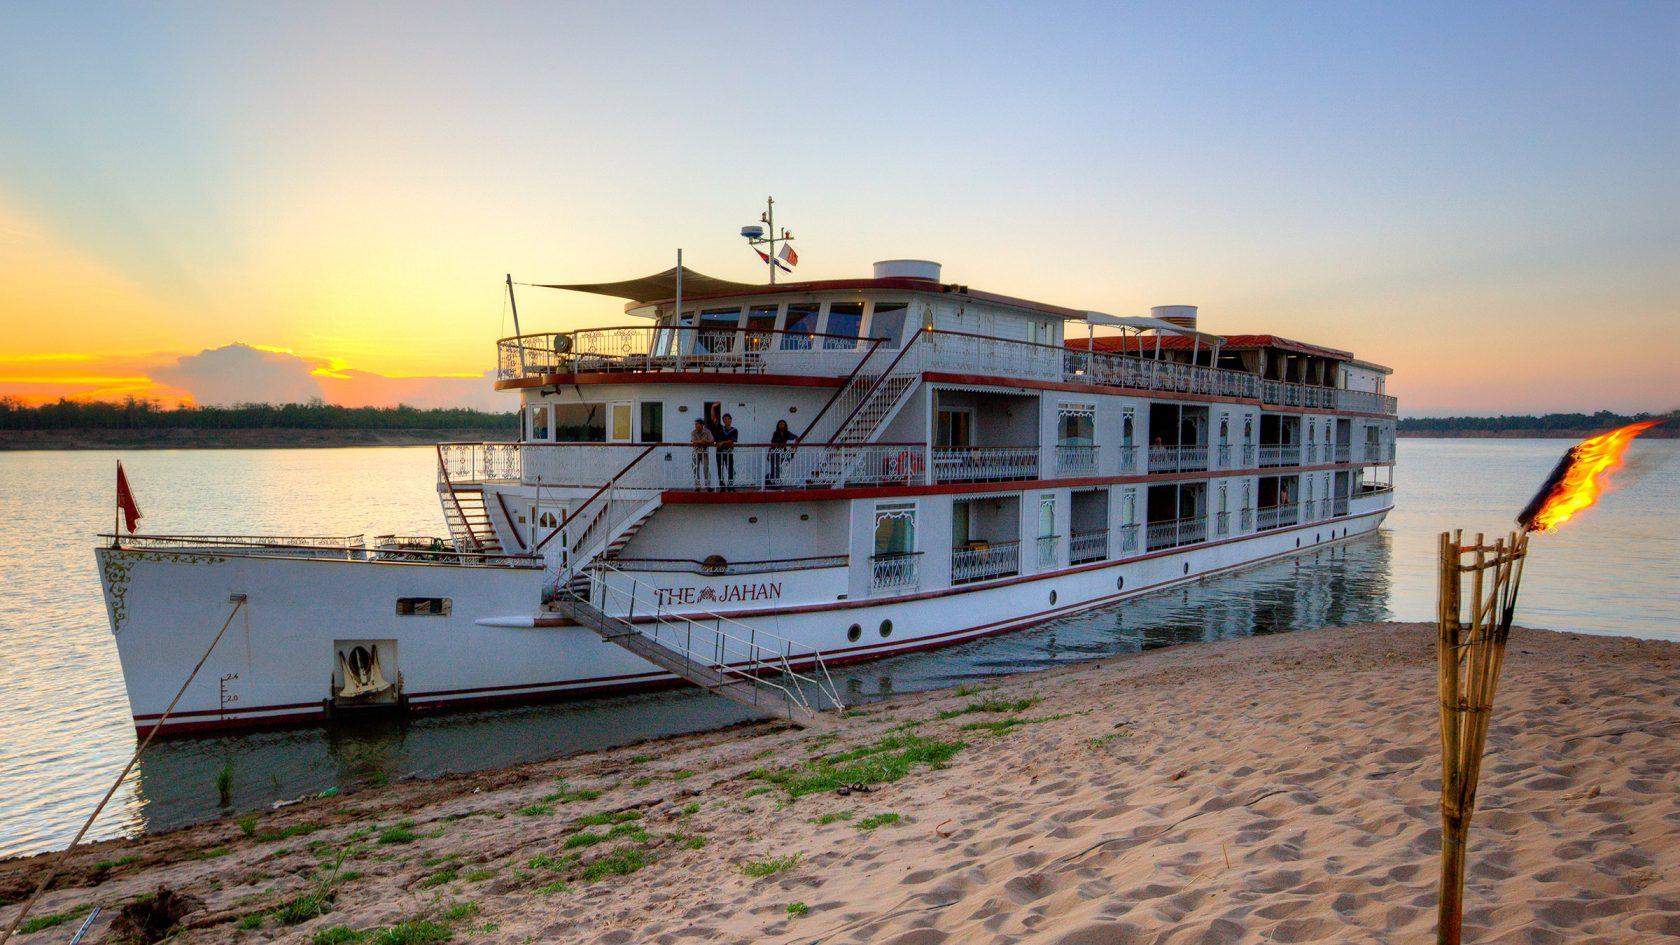 Mekong Flusskreuzfahrt Vietnam/ Kambodscha, Heritage Line: The Jahan